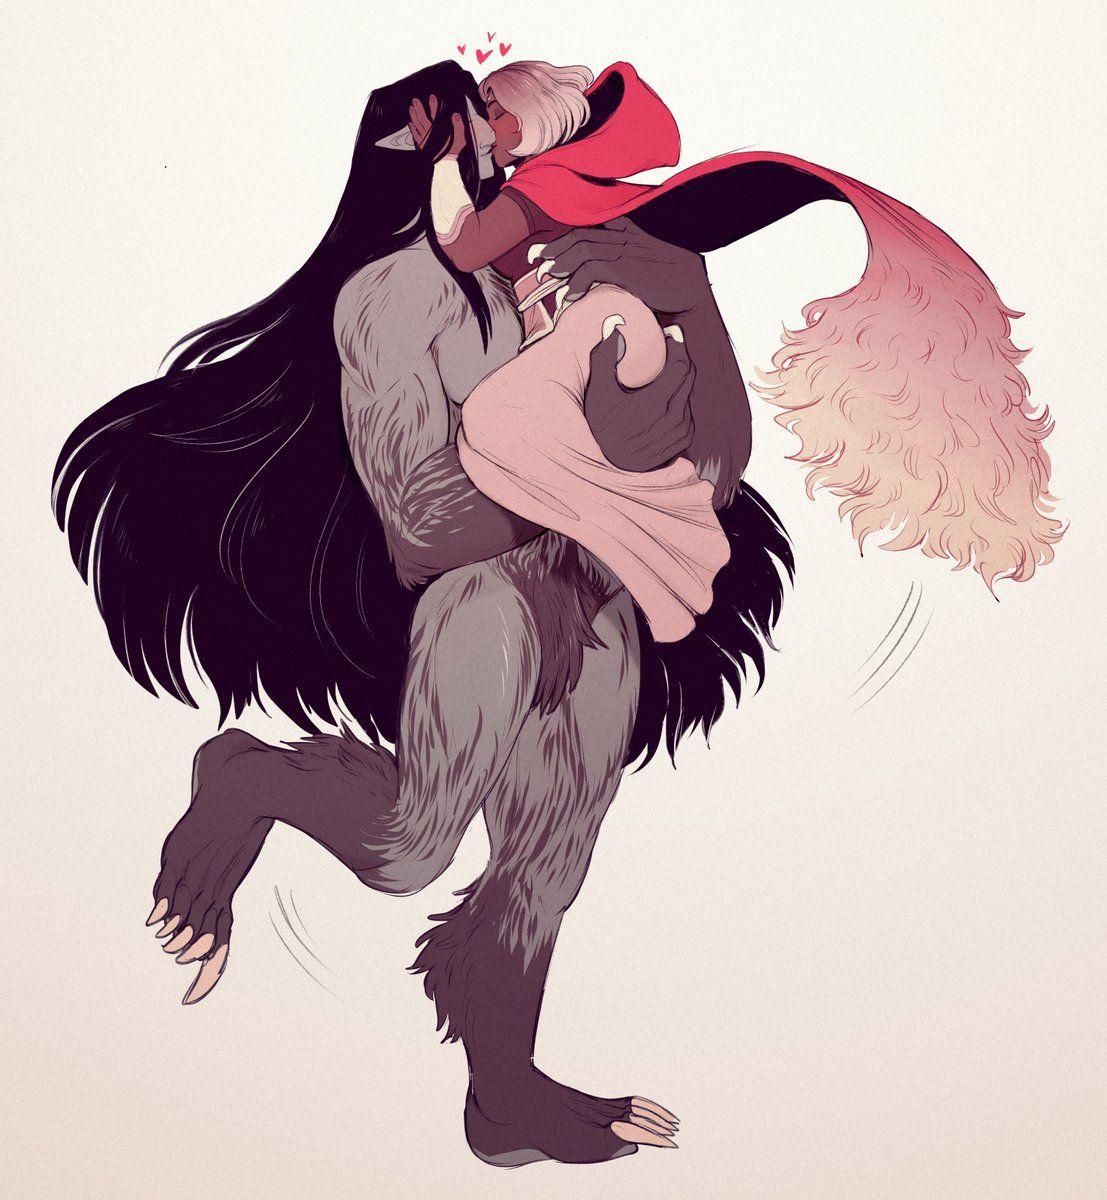 (2) Twitter | Werewolf, Moon goddess, Anime